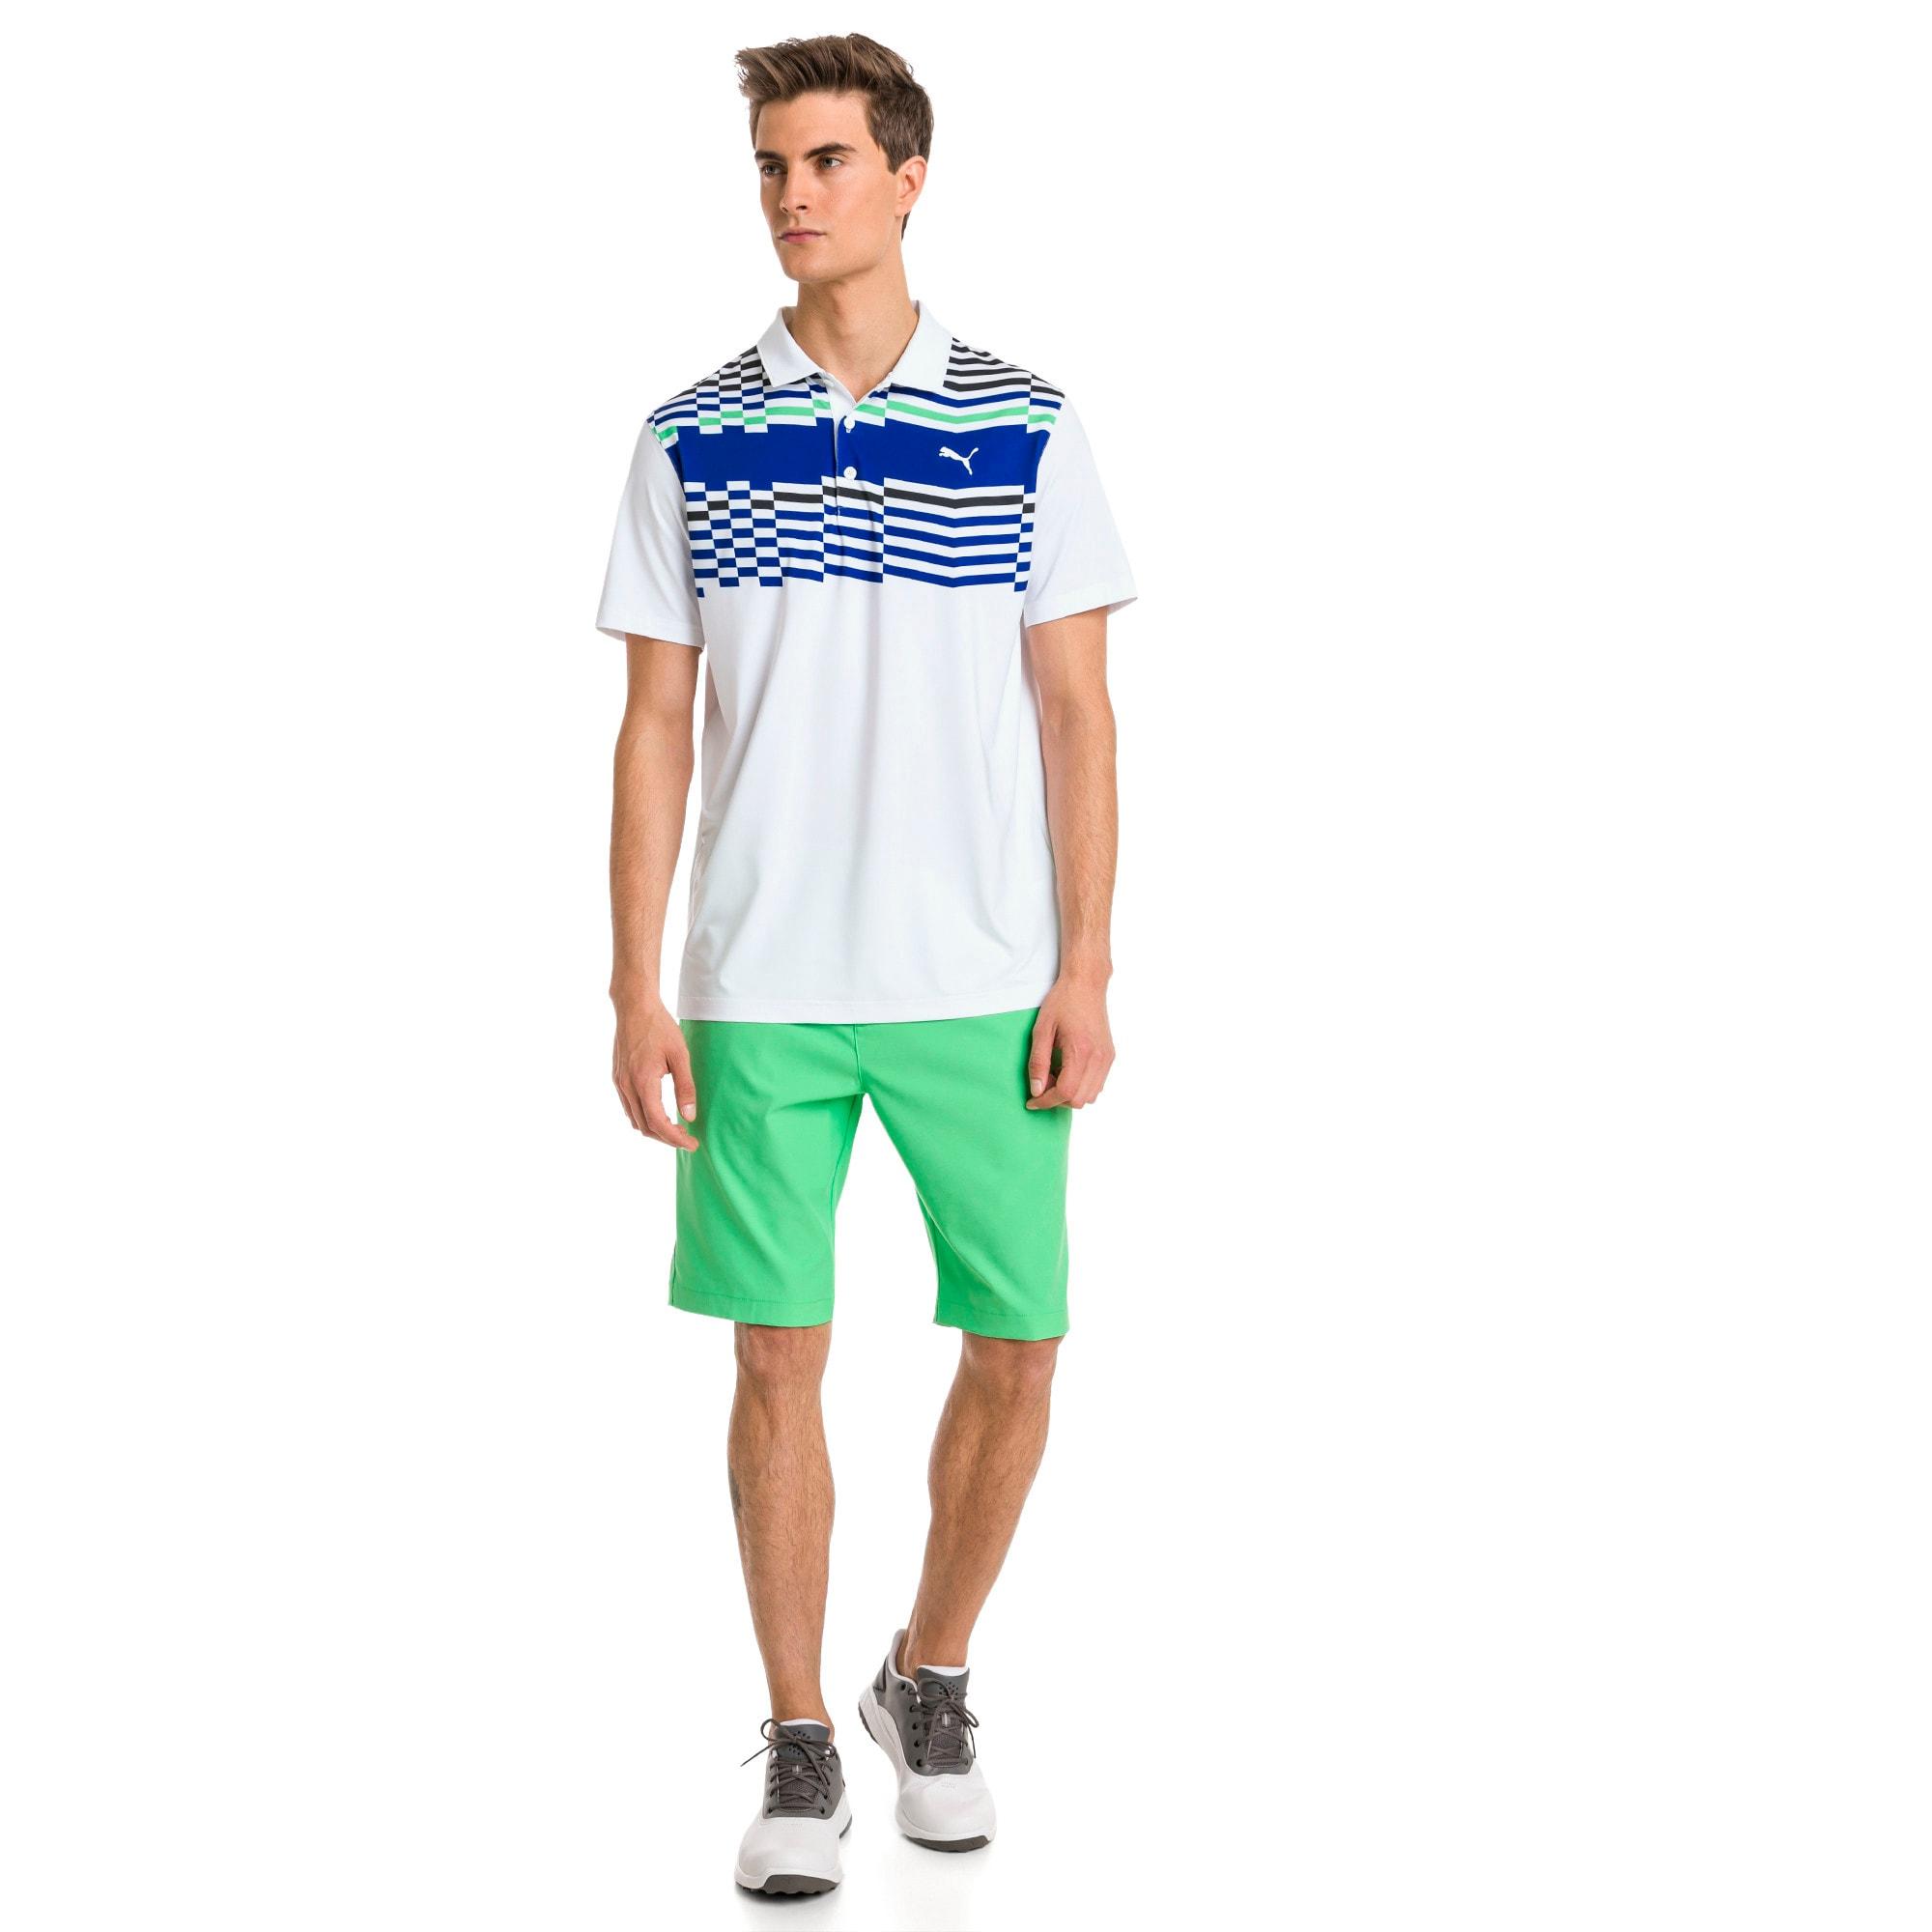 Thumbnail 3 of Road Map Men's Golf Polo, Bright White-Irish Green, medium